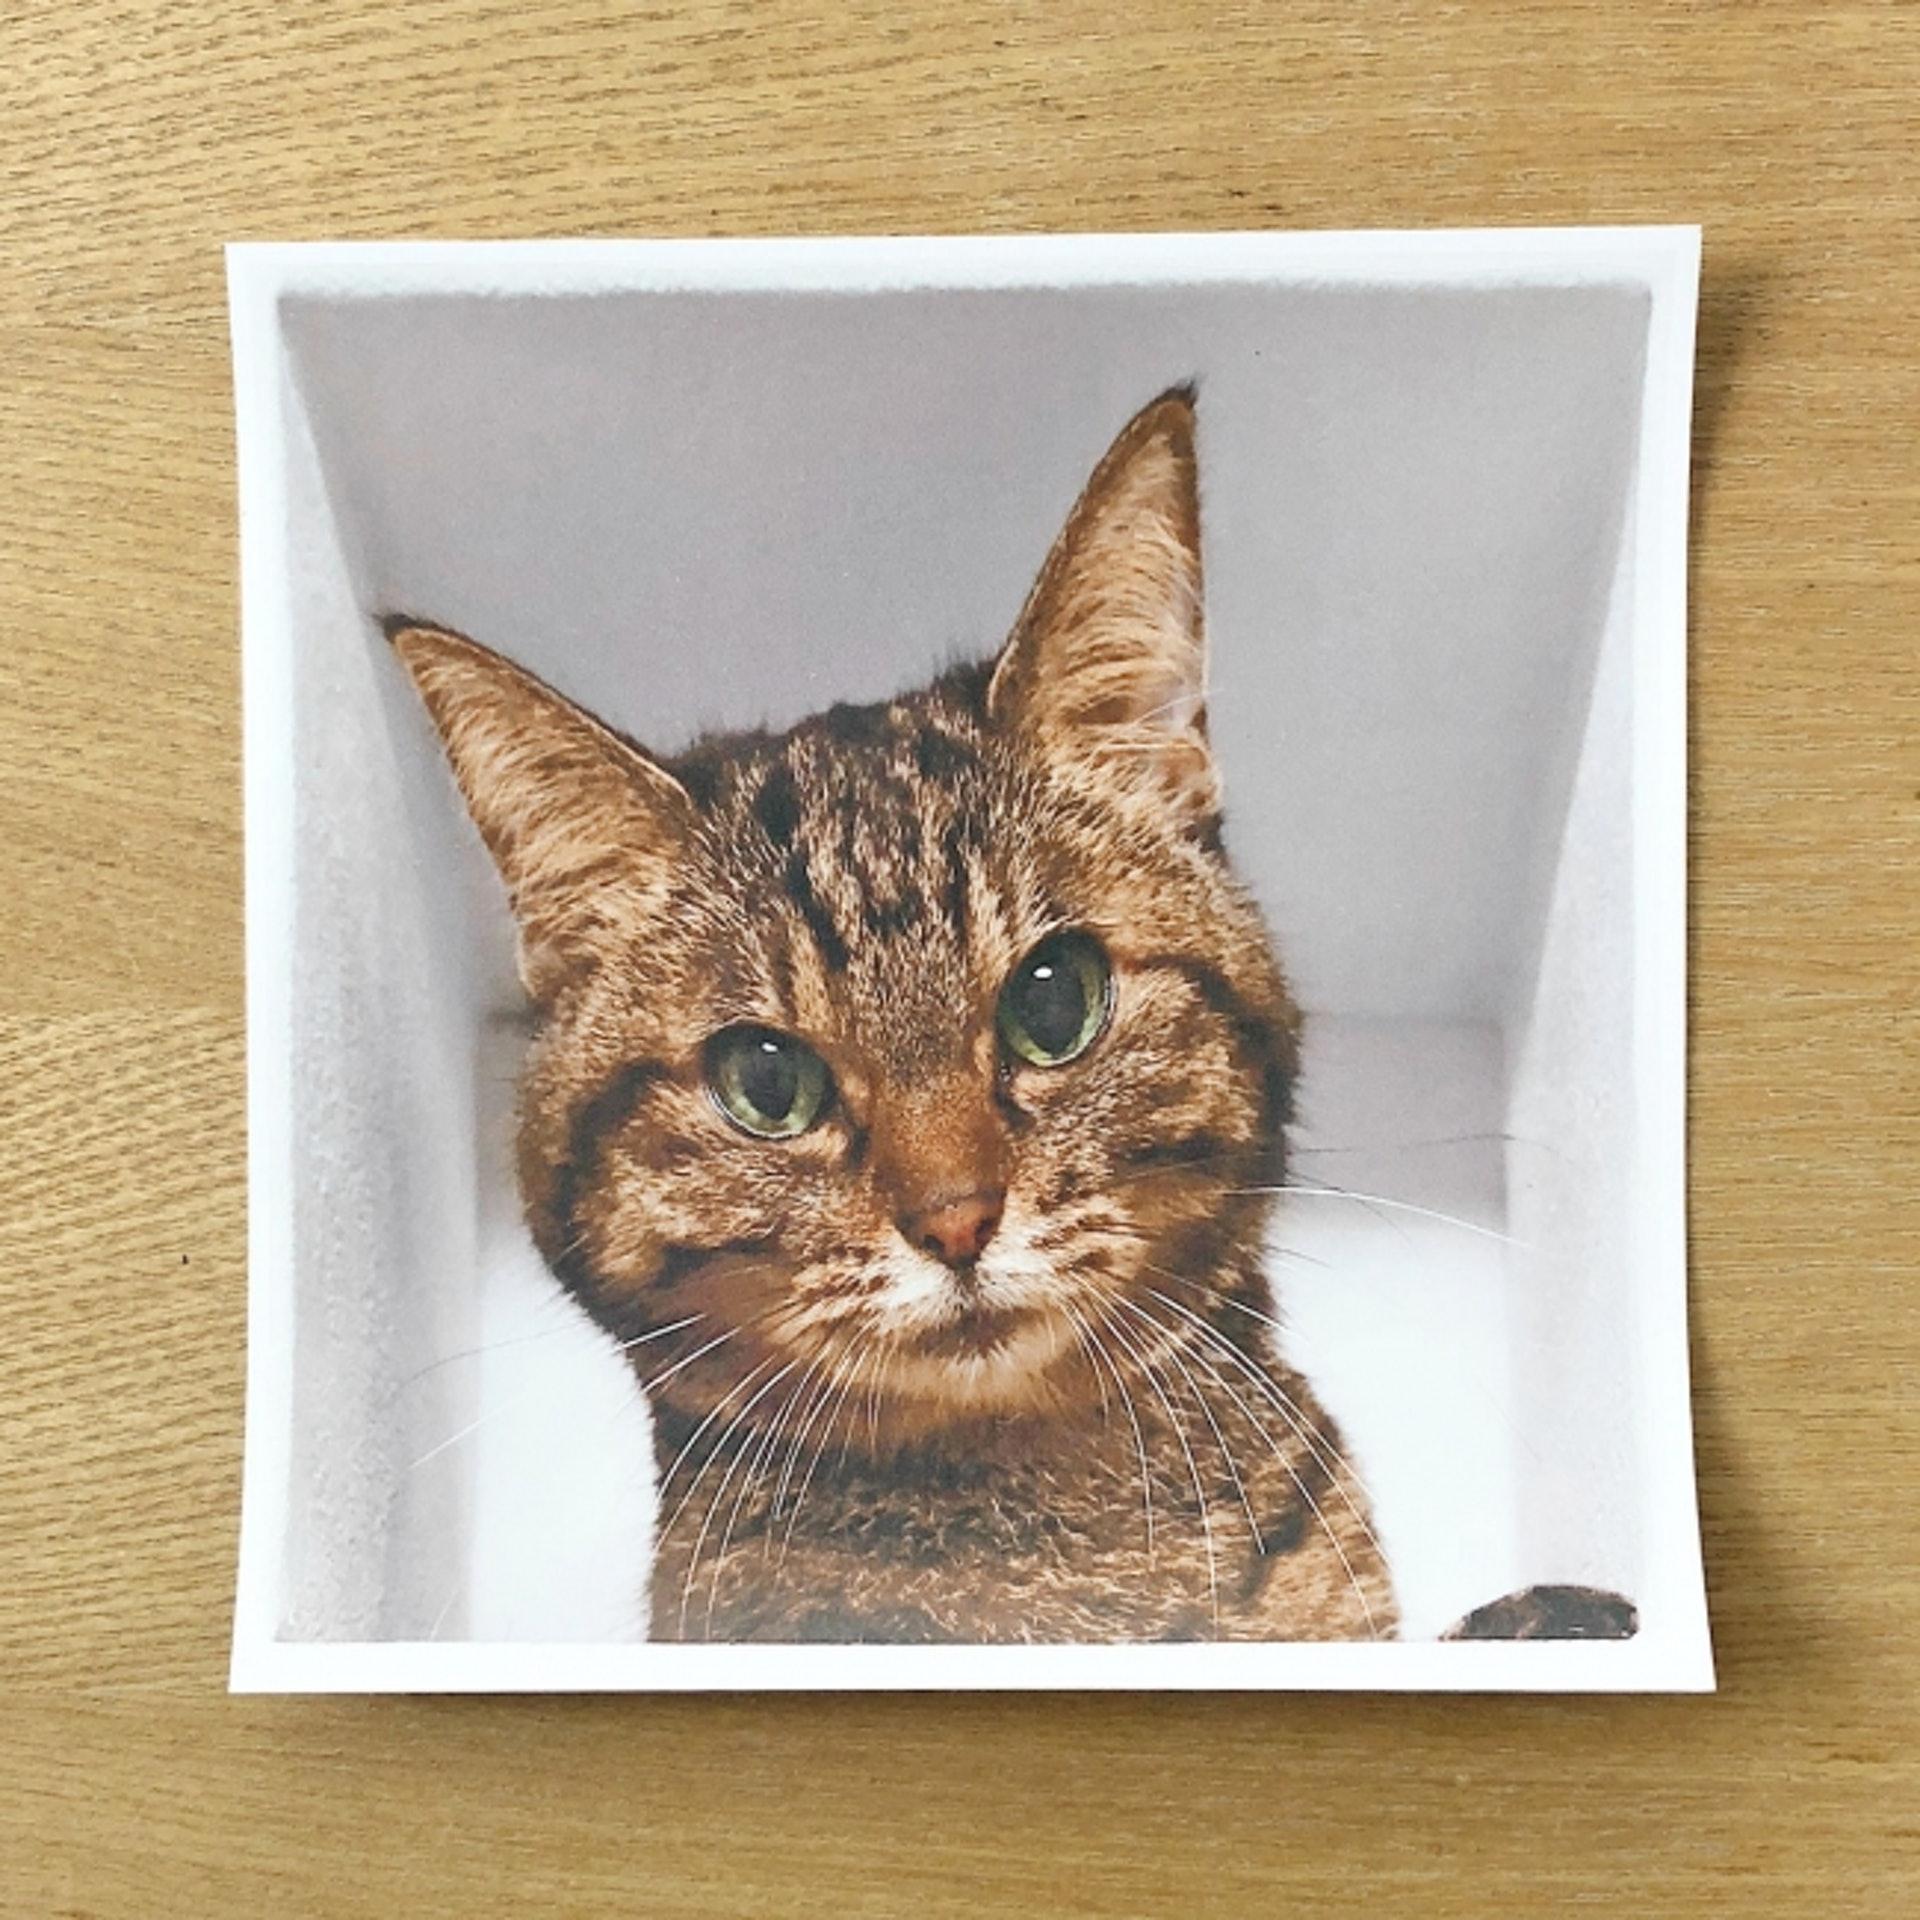 Delusion Mapping貓暗中觀察牆上貼紙:約18cm x 18cm大。